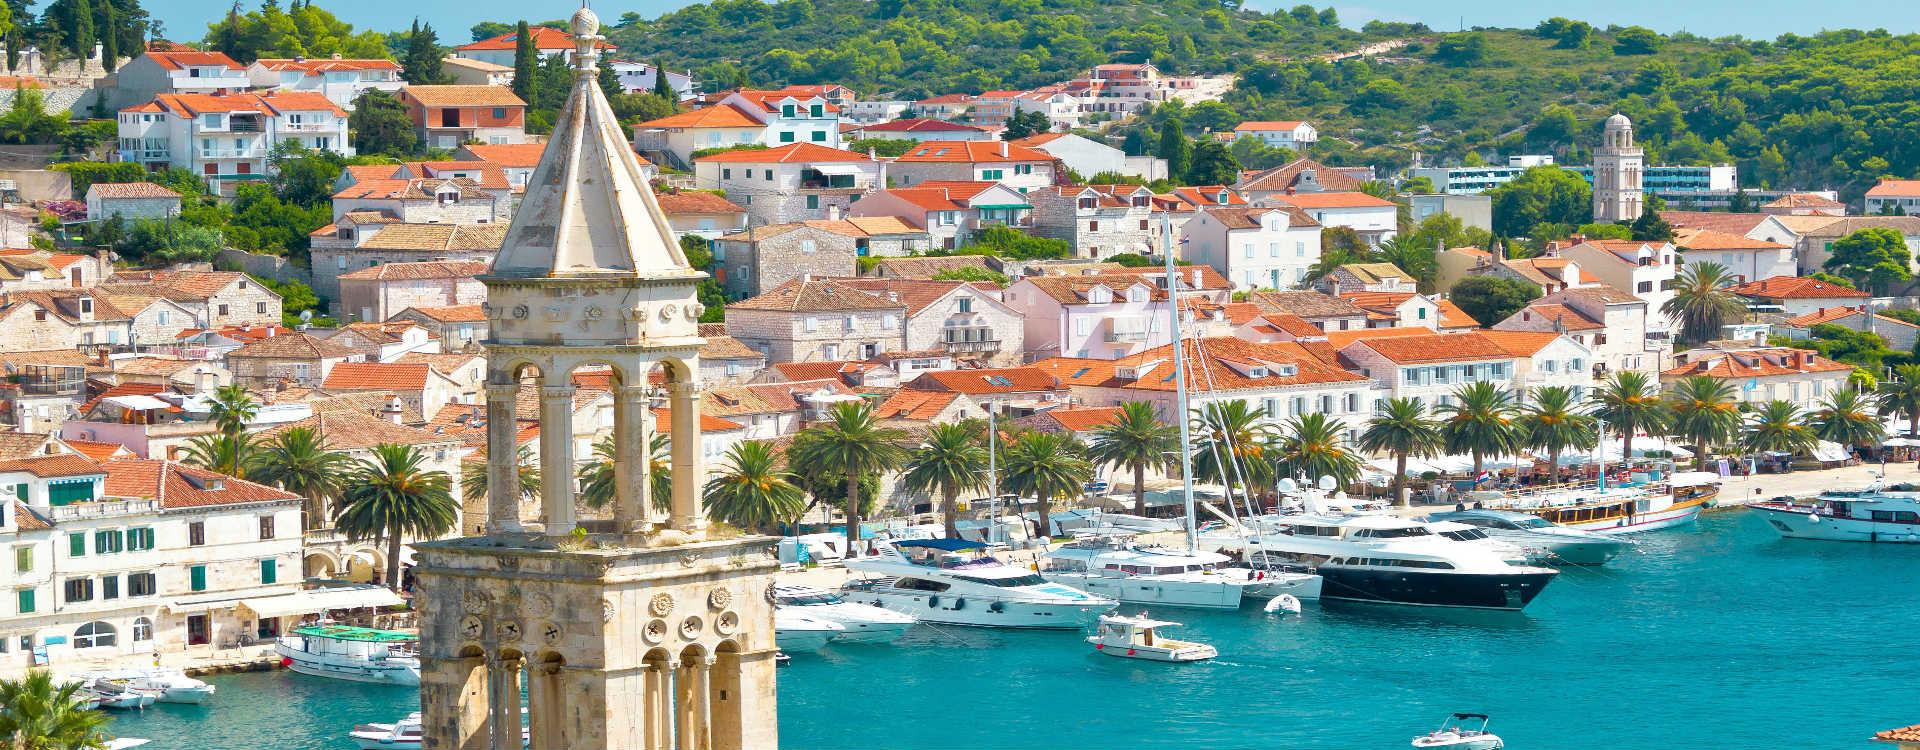 Excursiones Cruceros Split a pie – Tour Privado